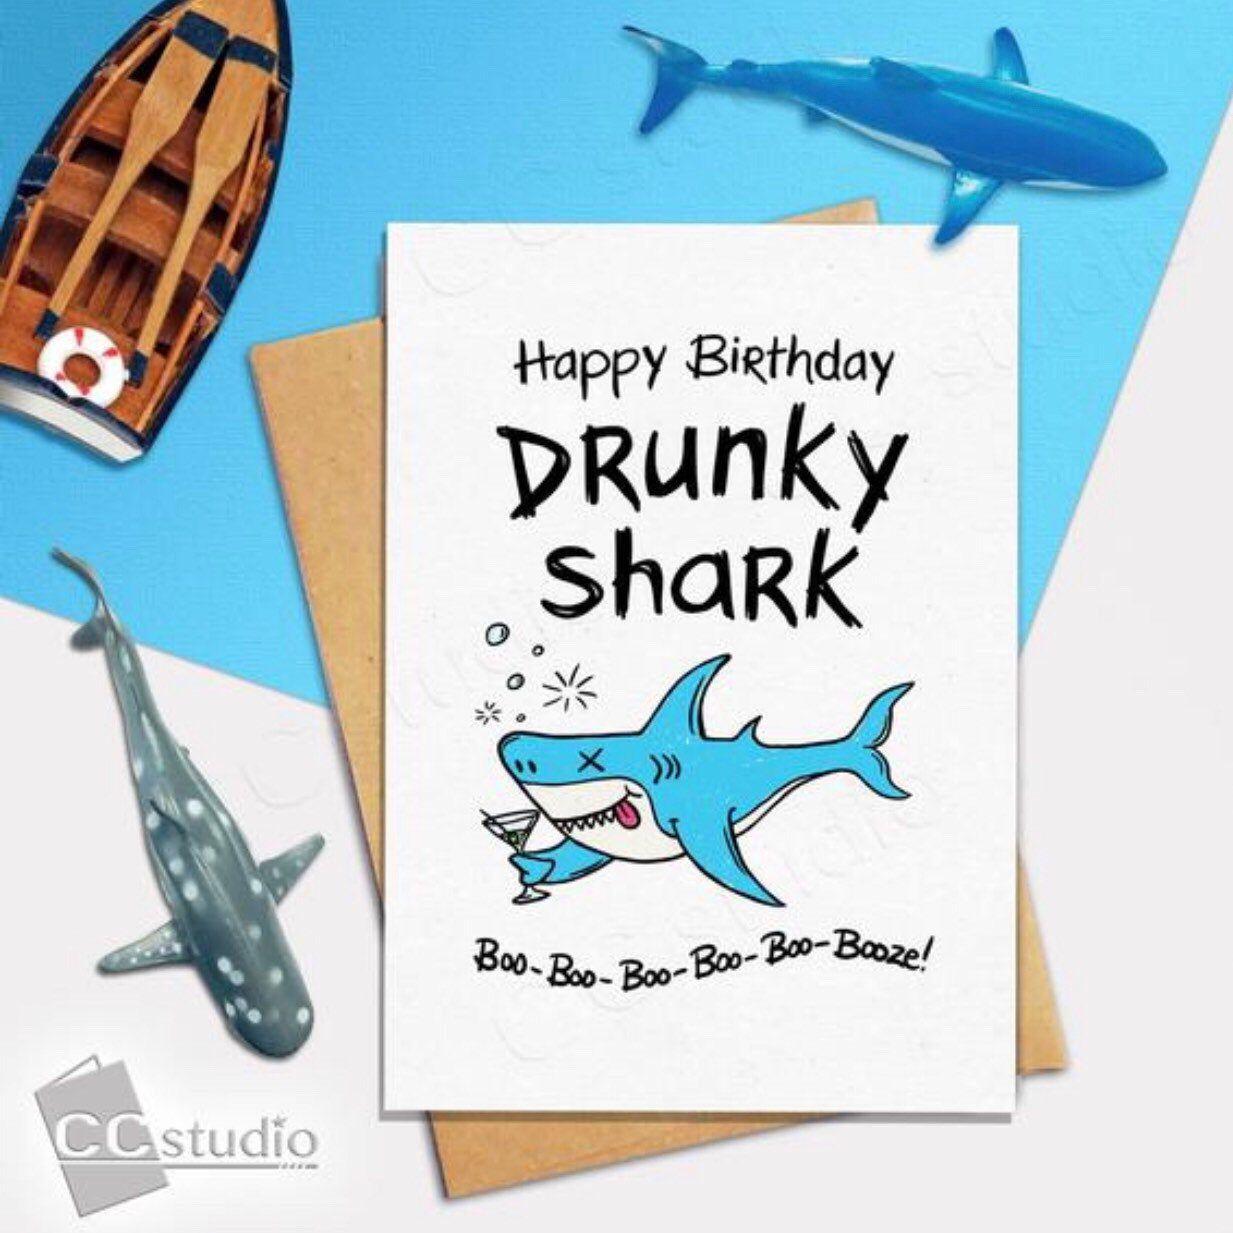 Funny Birthday Card Drunky Shark Best Friend Birthday Card Shark Card Birthday Card for Him Her Daddy Shark Card Thinking of You Card